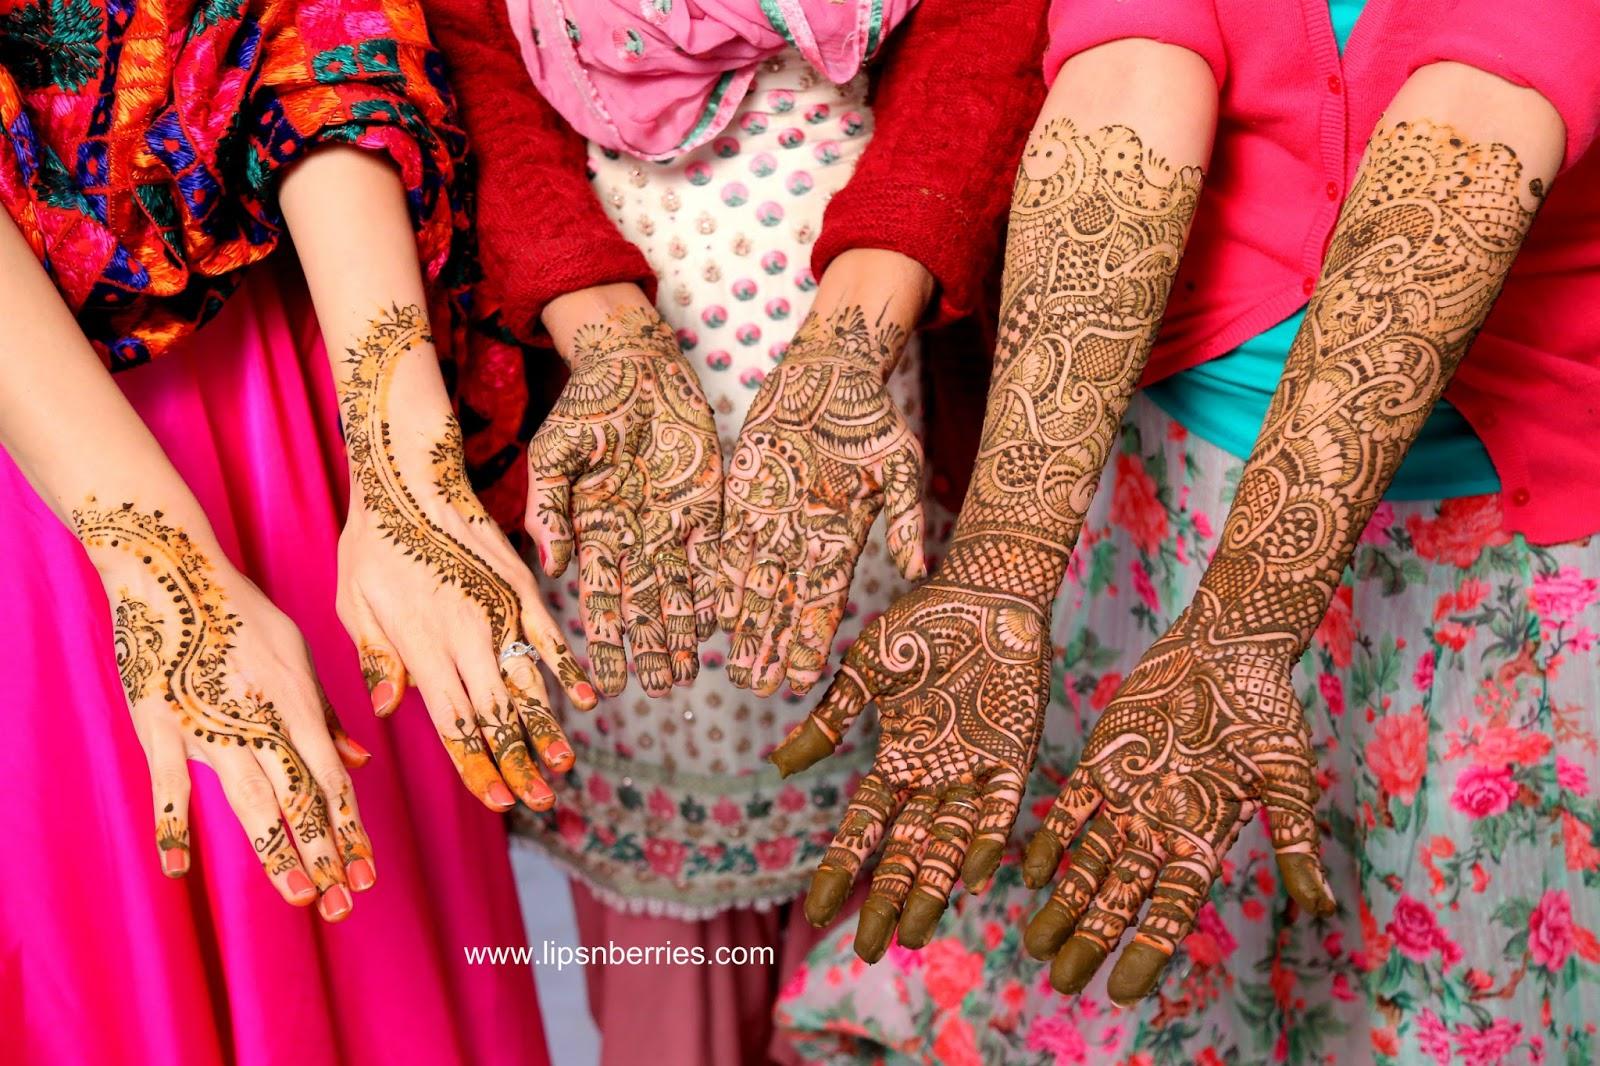 Mehendi Ceremony S List : Lips n berries my sisters wedding shenangians part henna